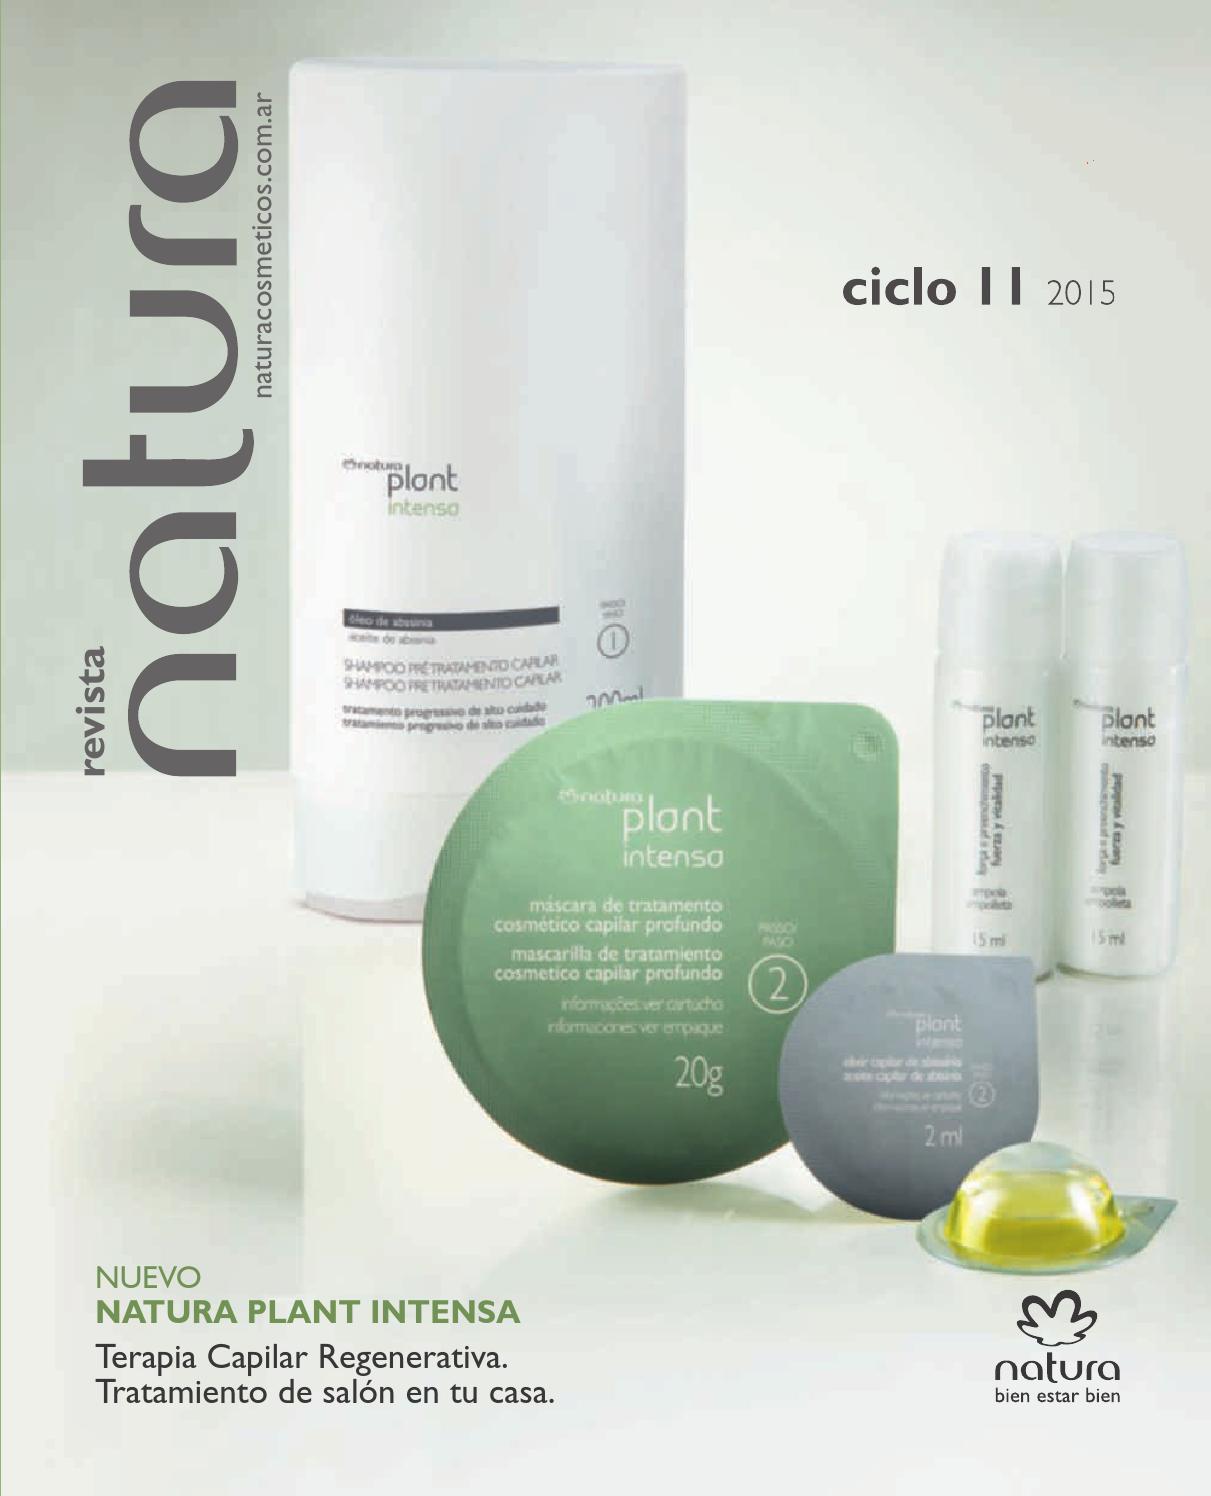 Cat logo natura ciclo 11 2015 argentina by natura cordoba - Natura home catalogo ...